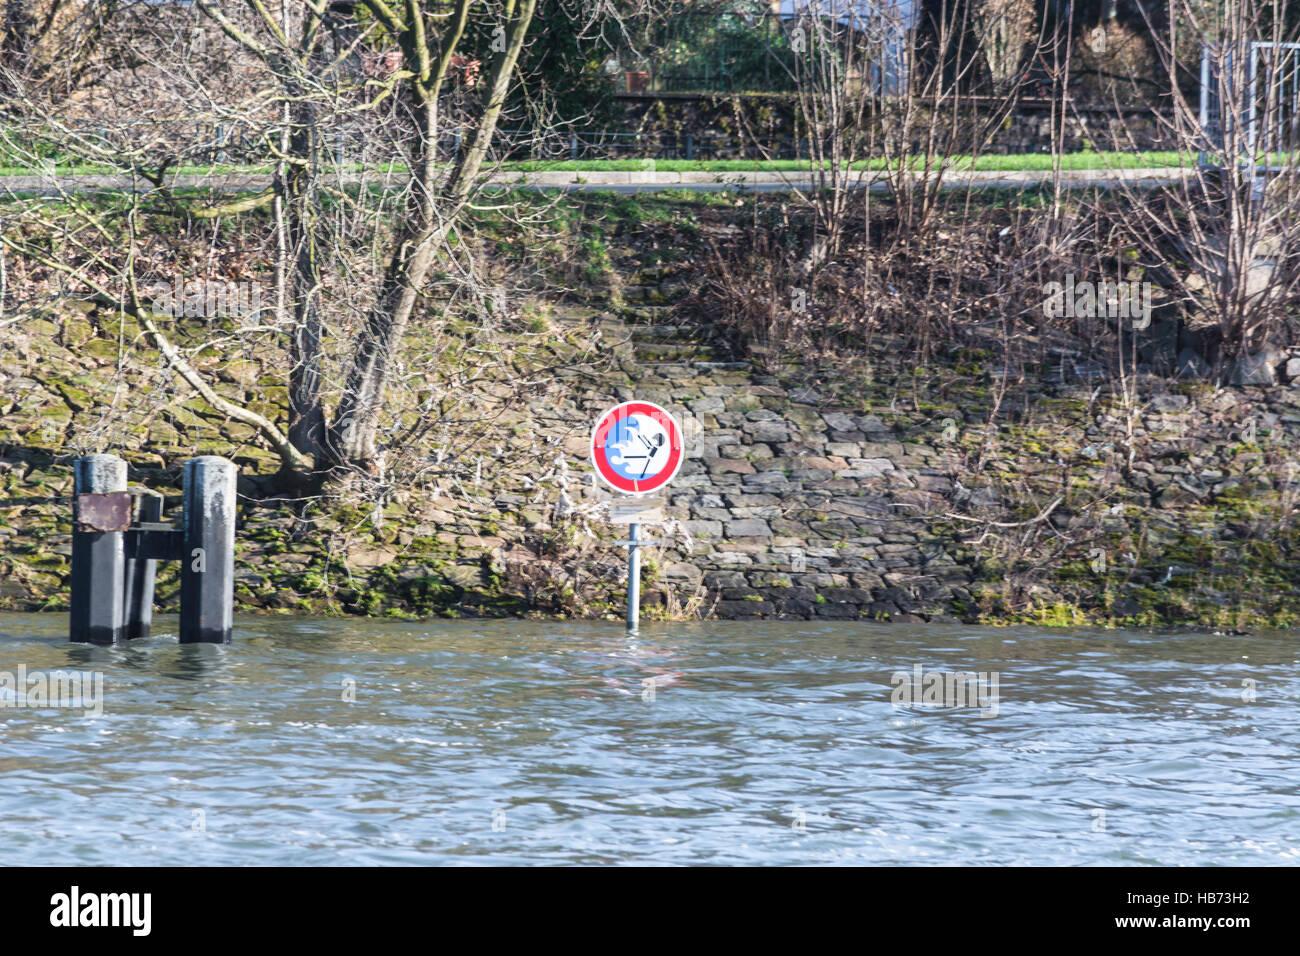 Flooded embankment in heavy rain - Stock Image